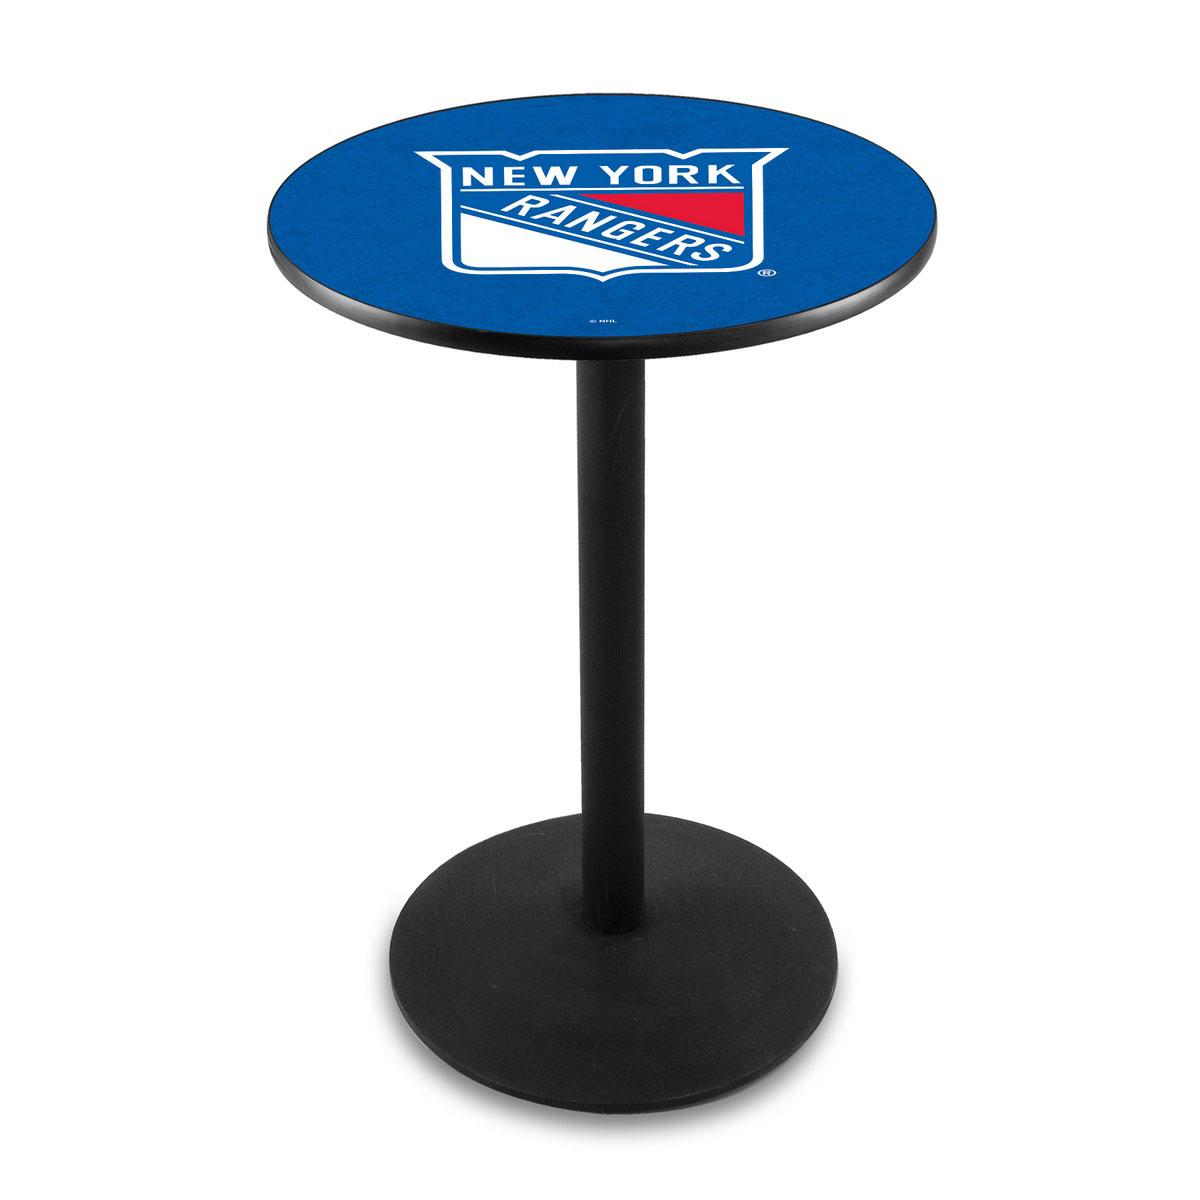 Tasteful New York Rangers Logo Pub Bar Table Round Stand 26 1731